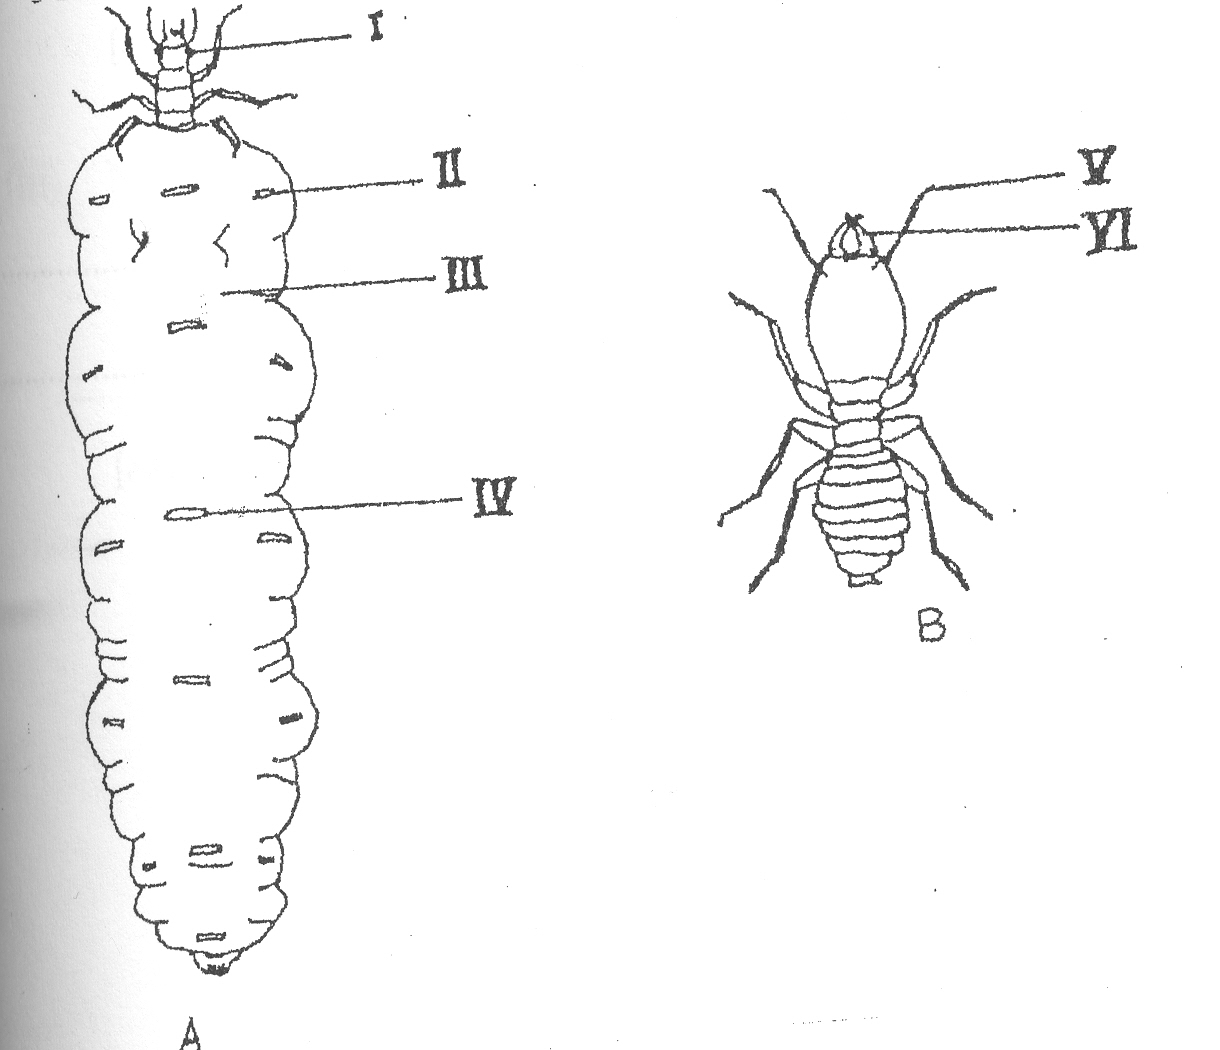 Termite queen anatomy - crazywidow.info